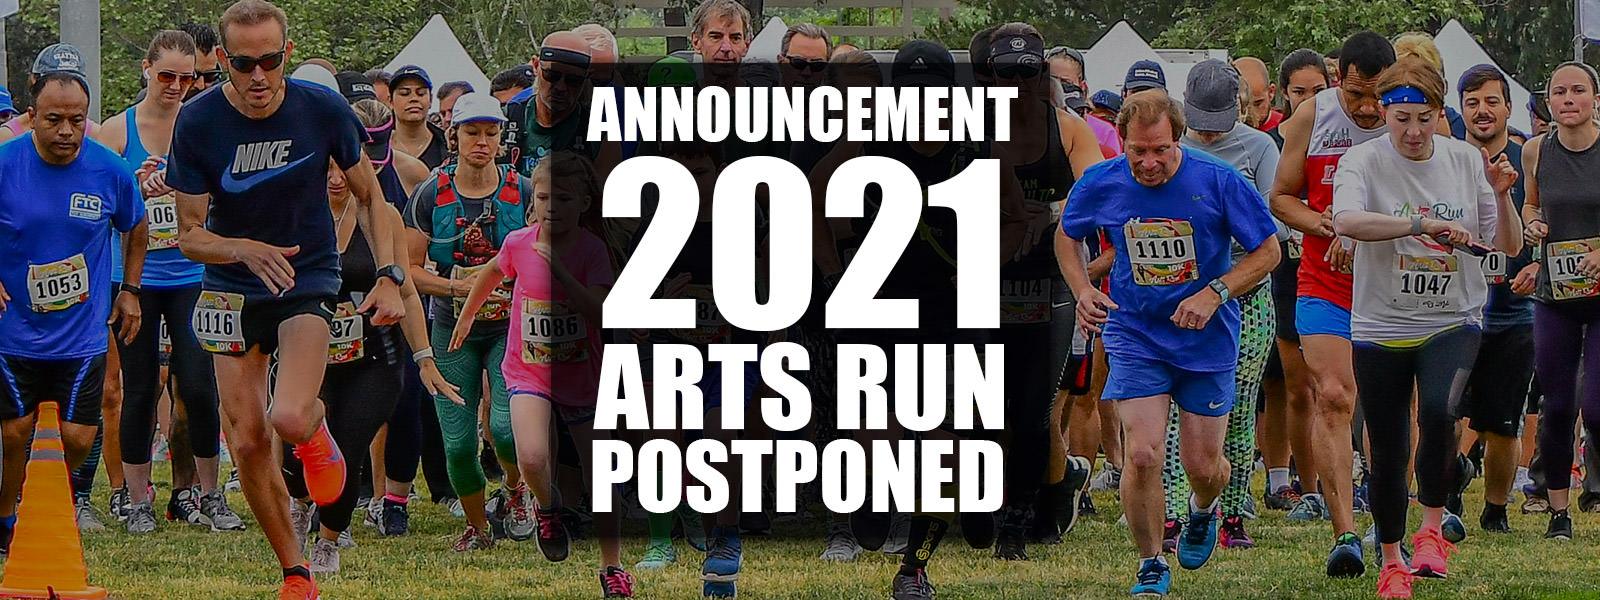 2021 ARTS RUN POSTPONED